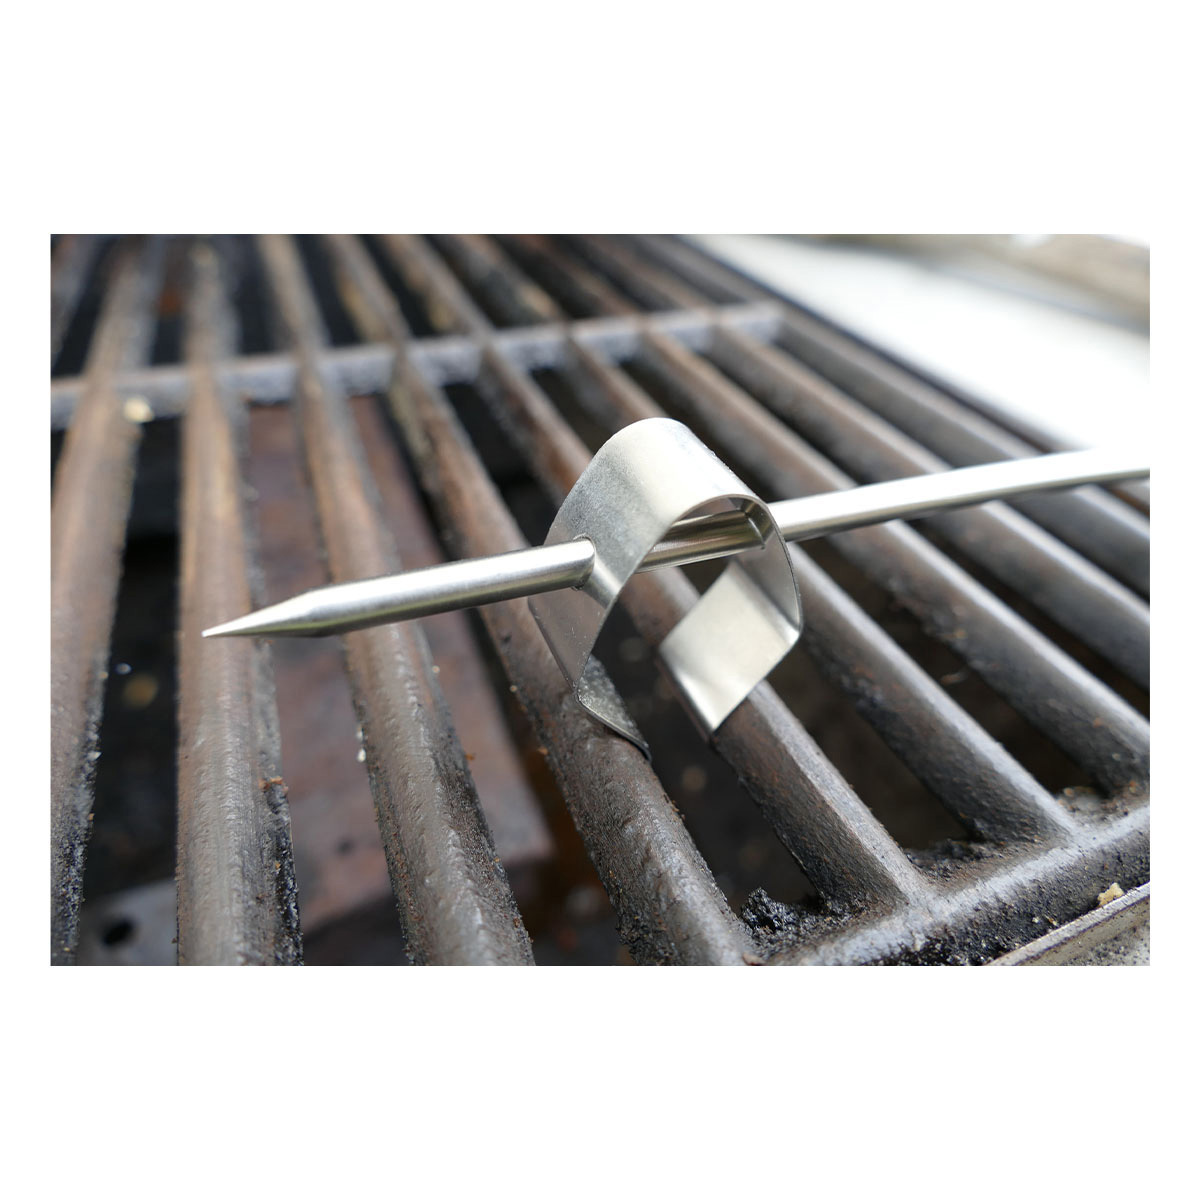 30-3525-60-clips-für-grill-bratenthermometer-anwendung-grill1-1200x1200px.jpg